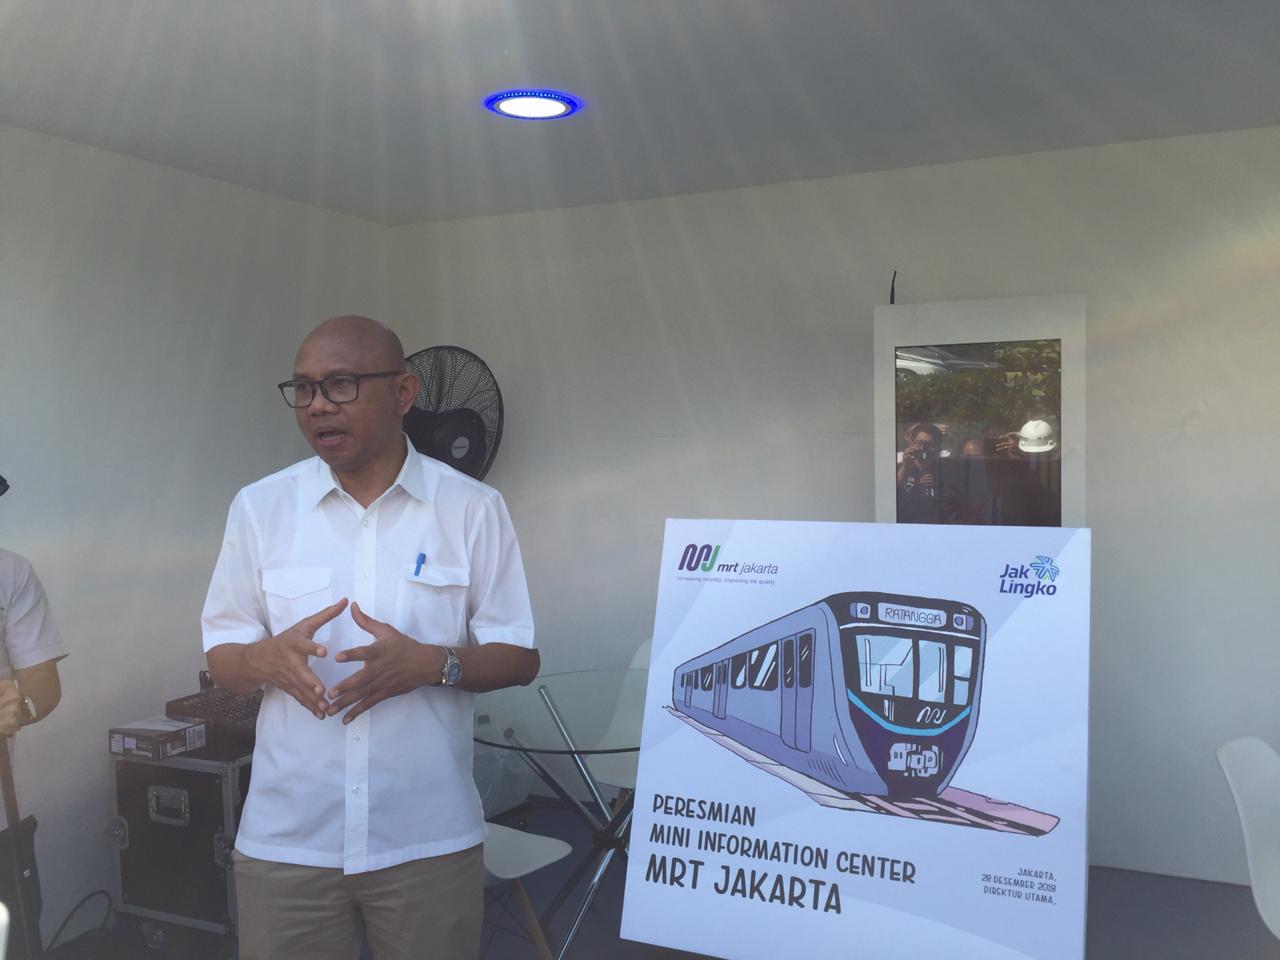 3 Stasiun Mrt Jakarta Sudah Diberi Nama Apa Saja Okezone Economy